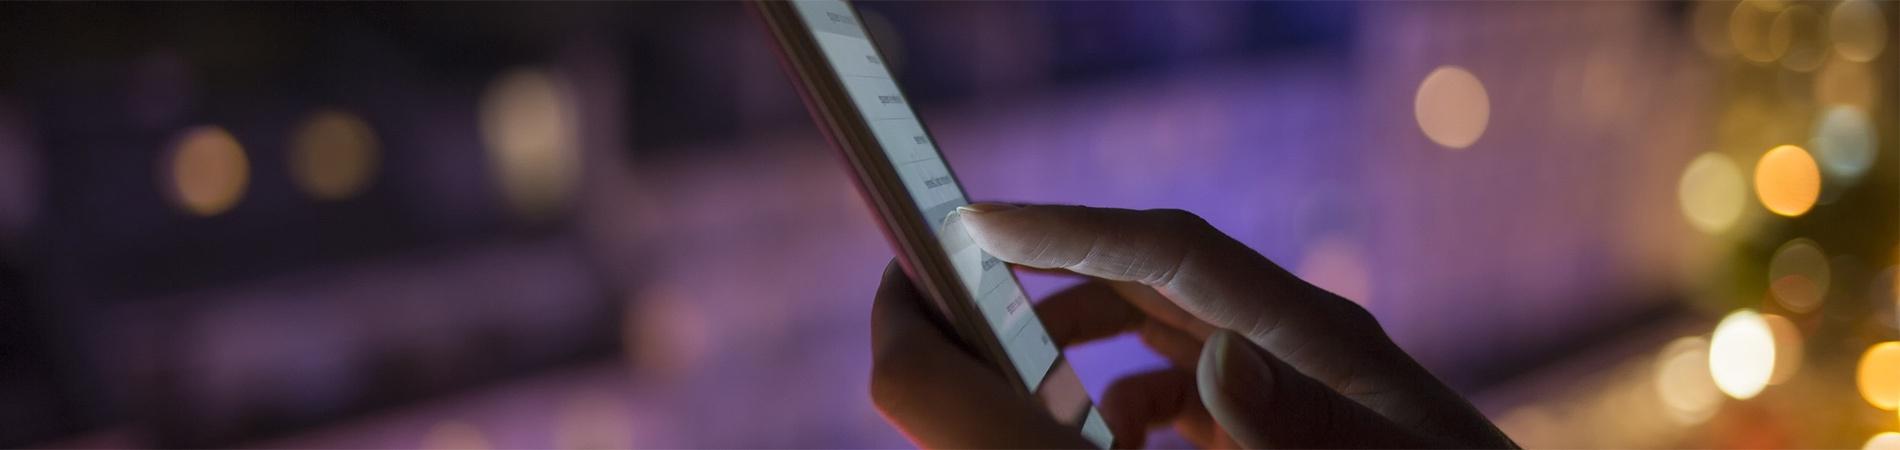 Solución de Wifi gestionado para empresas